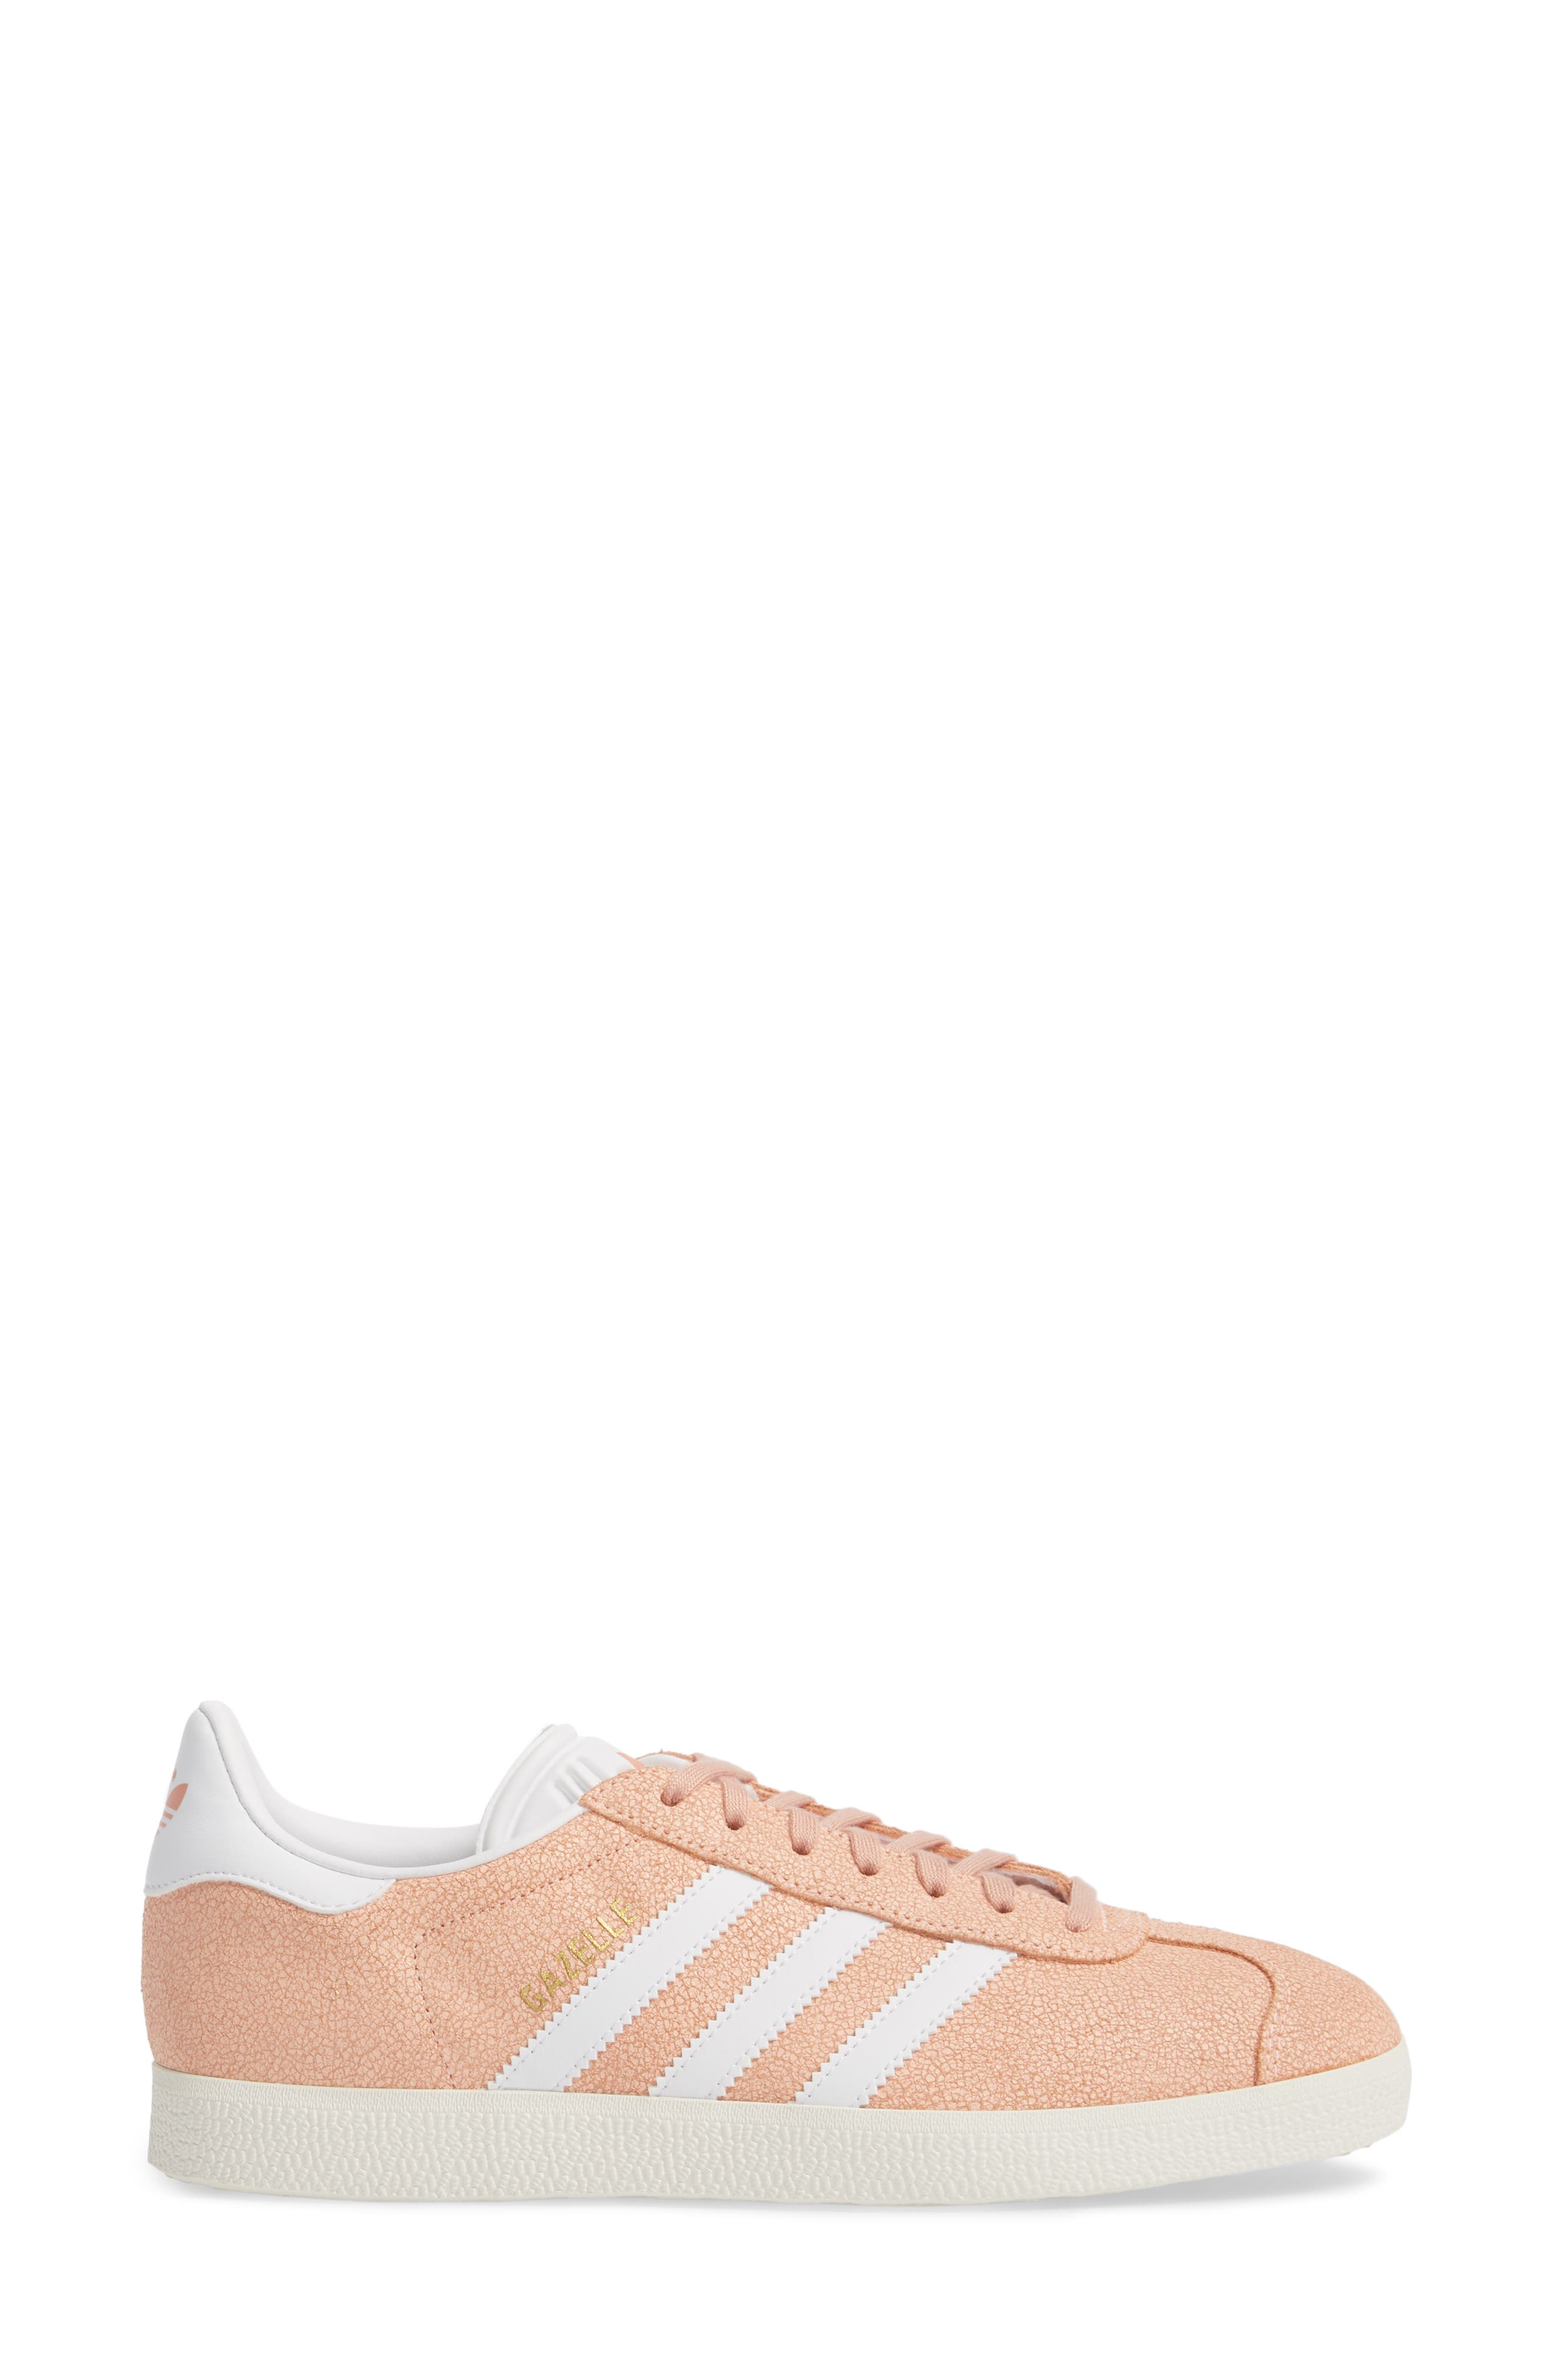 Gazelle Sneaker,                             Alternate thumbnail 3, color,                             Clear Orange/ White/ Off White